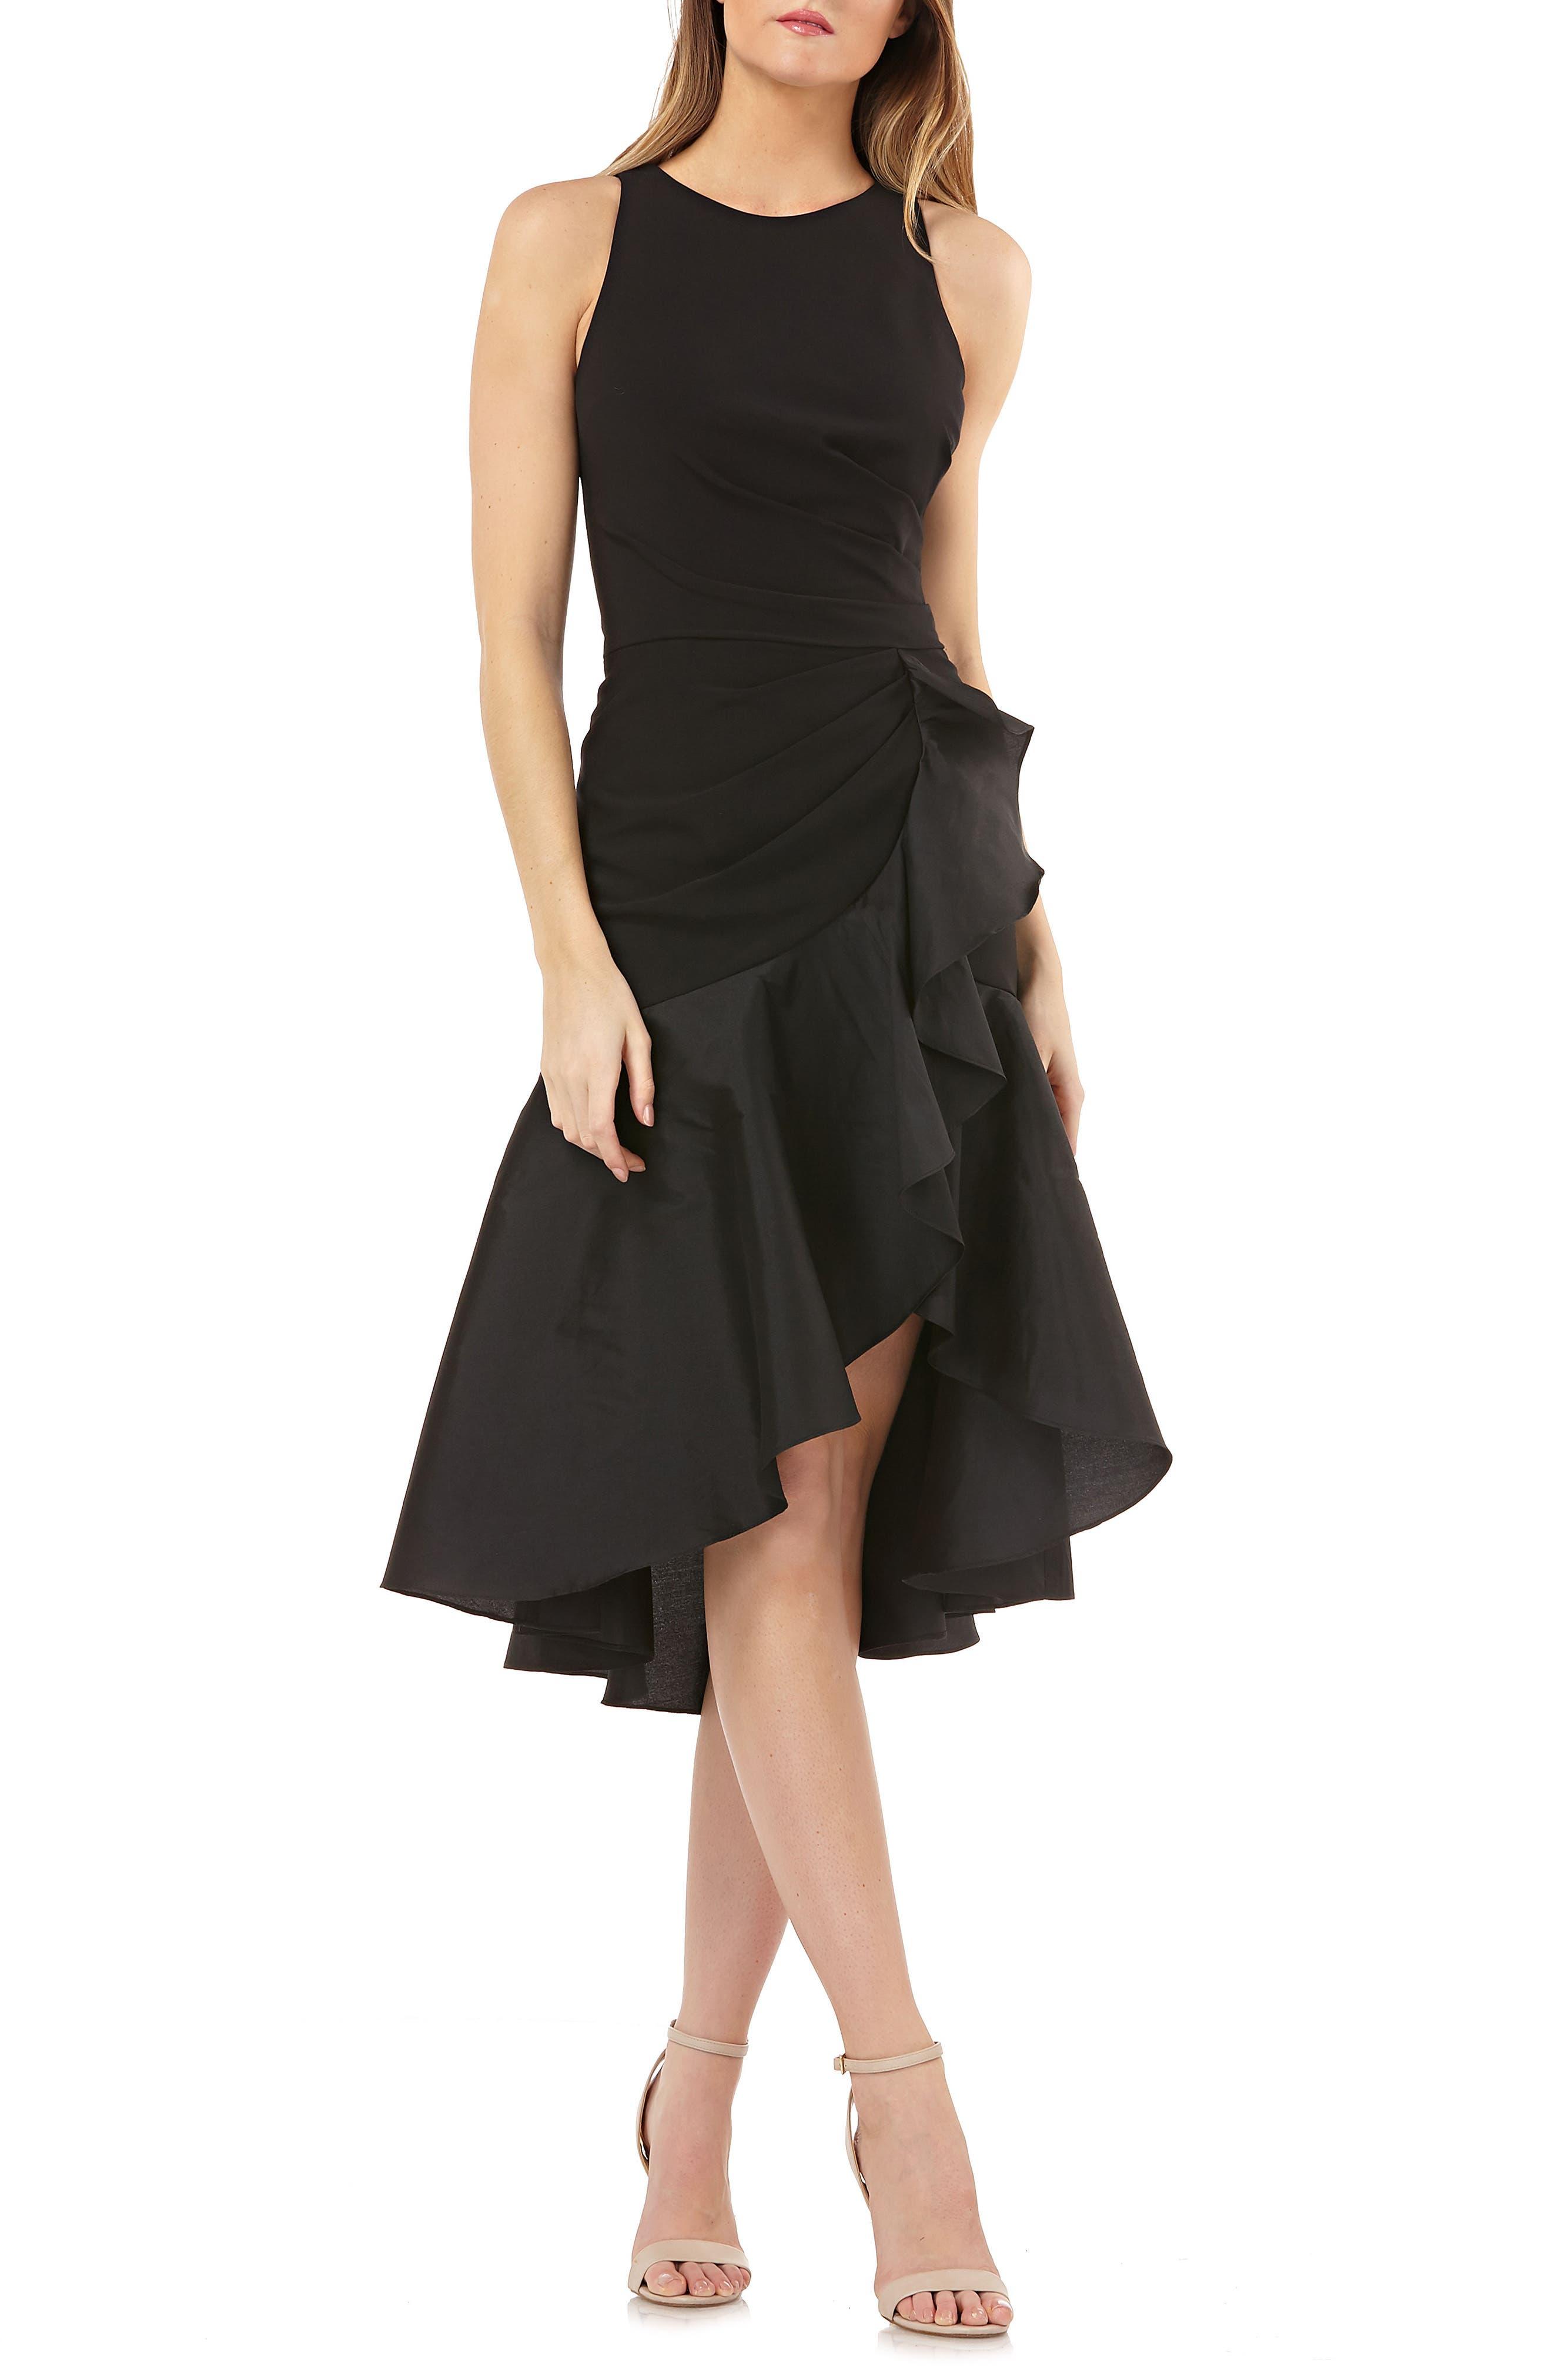 Crepe Contrast Ruffle Cocktail Dress,                             Main thumbnail 1, color,                             BLACK